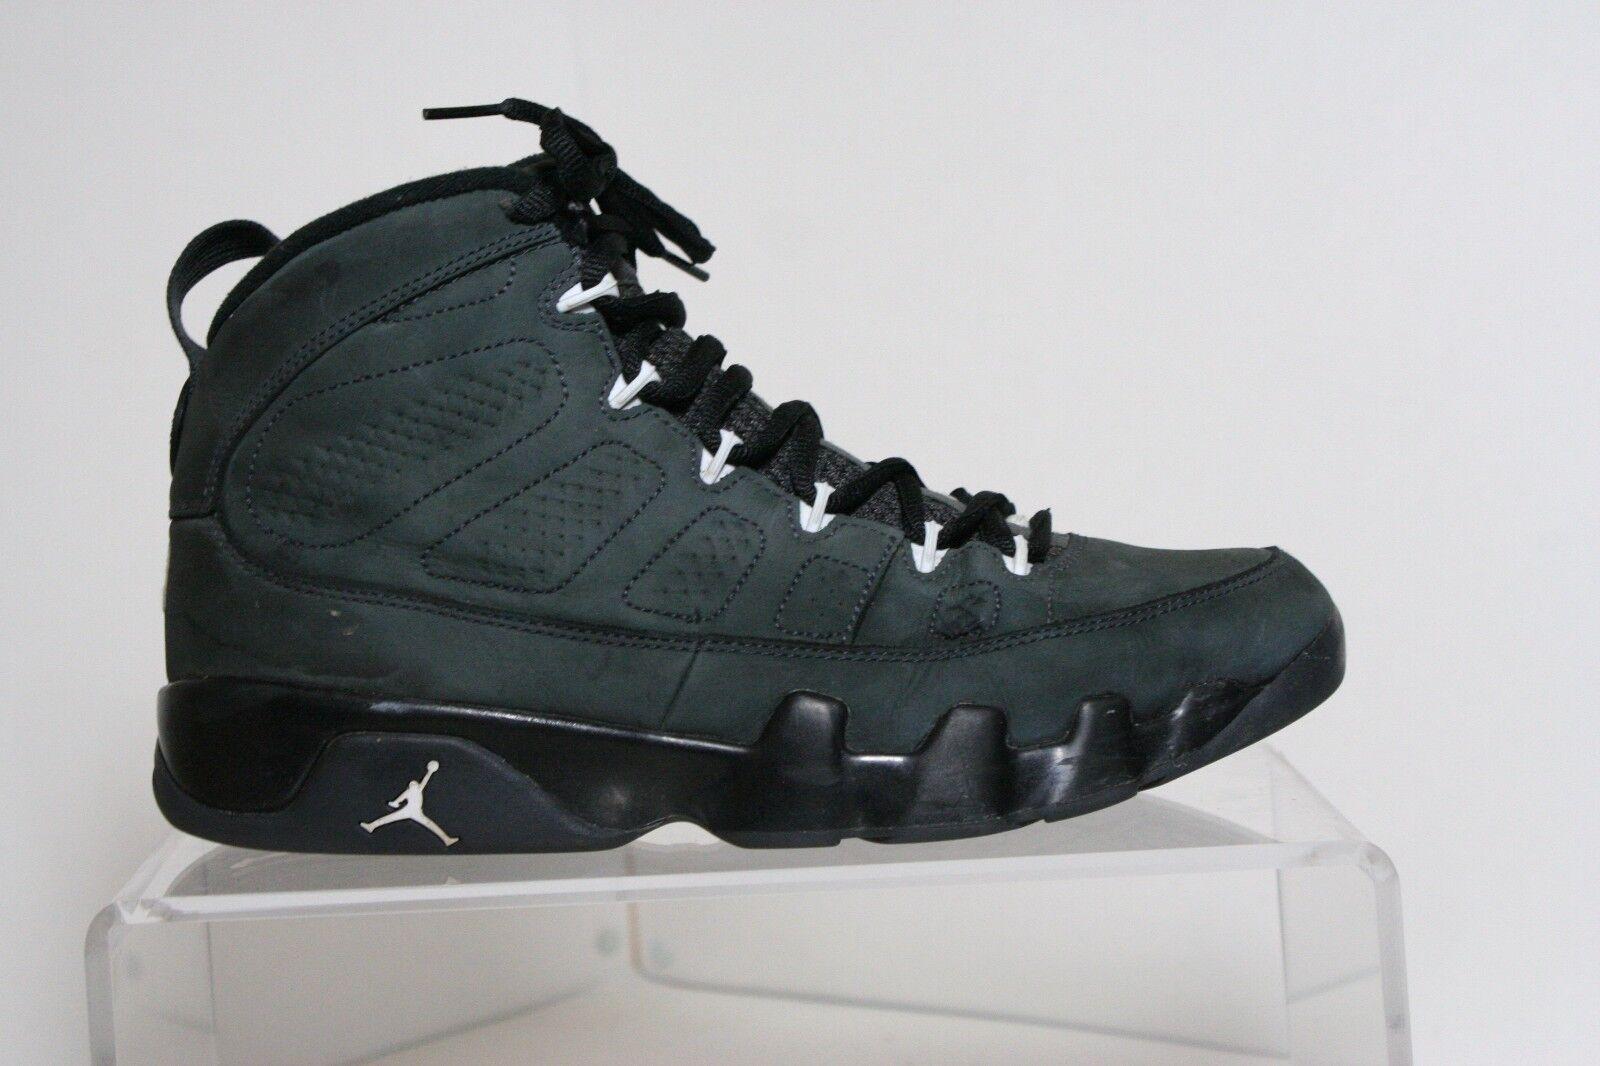 Nike Air Jordan IX 9 Retro 15' Sneaker Athletic Anthracite Men 10.5 B-Ball Hip